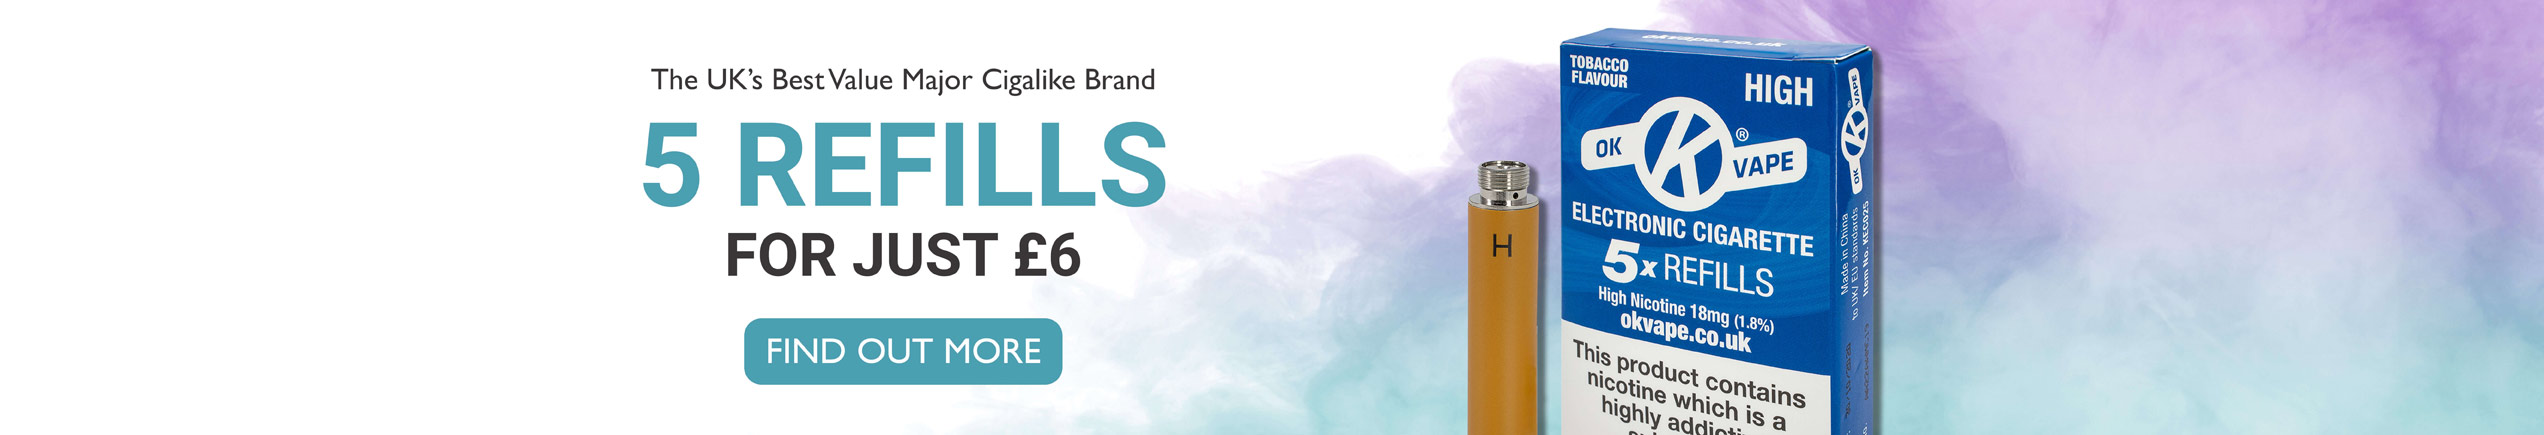 Homepage slider image - The UK's best value major cigalike brand - 5 Refills for just £6